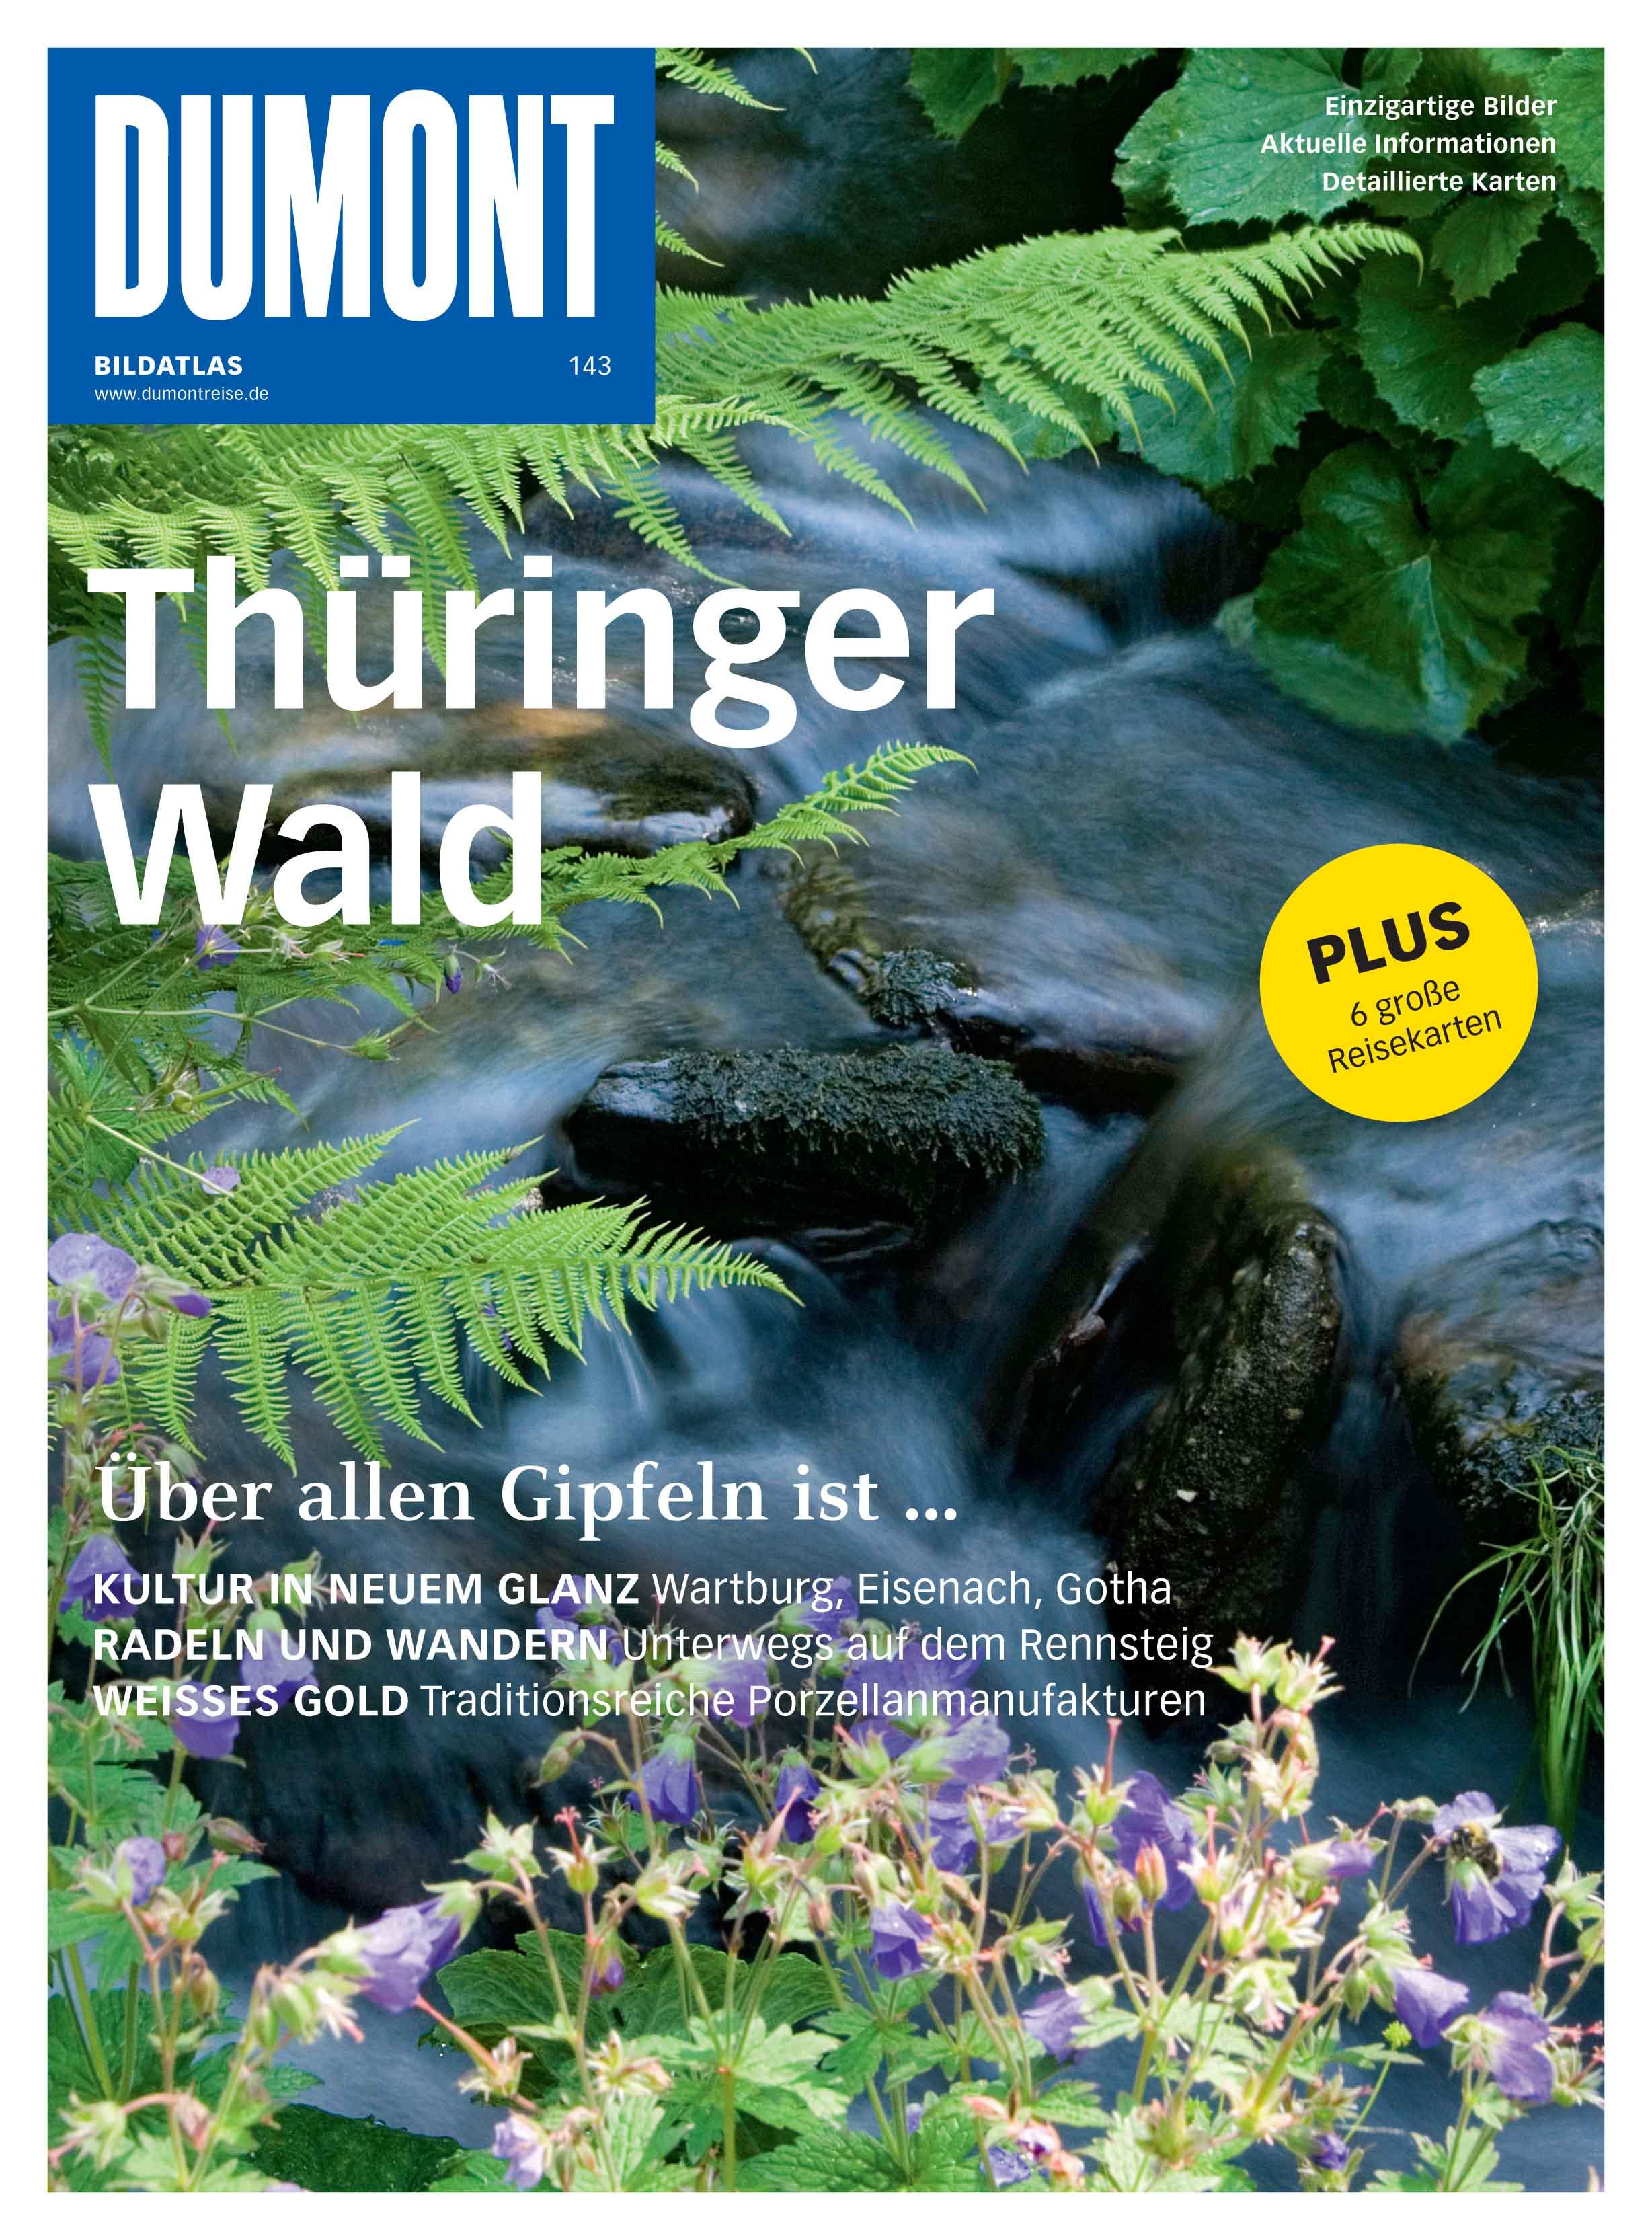 Dumont Bildatlas Thüringer Wald